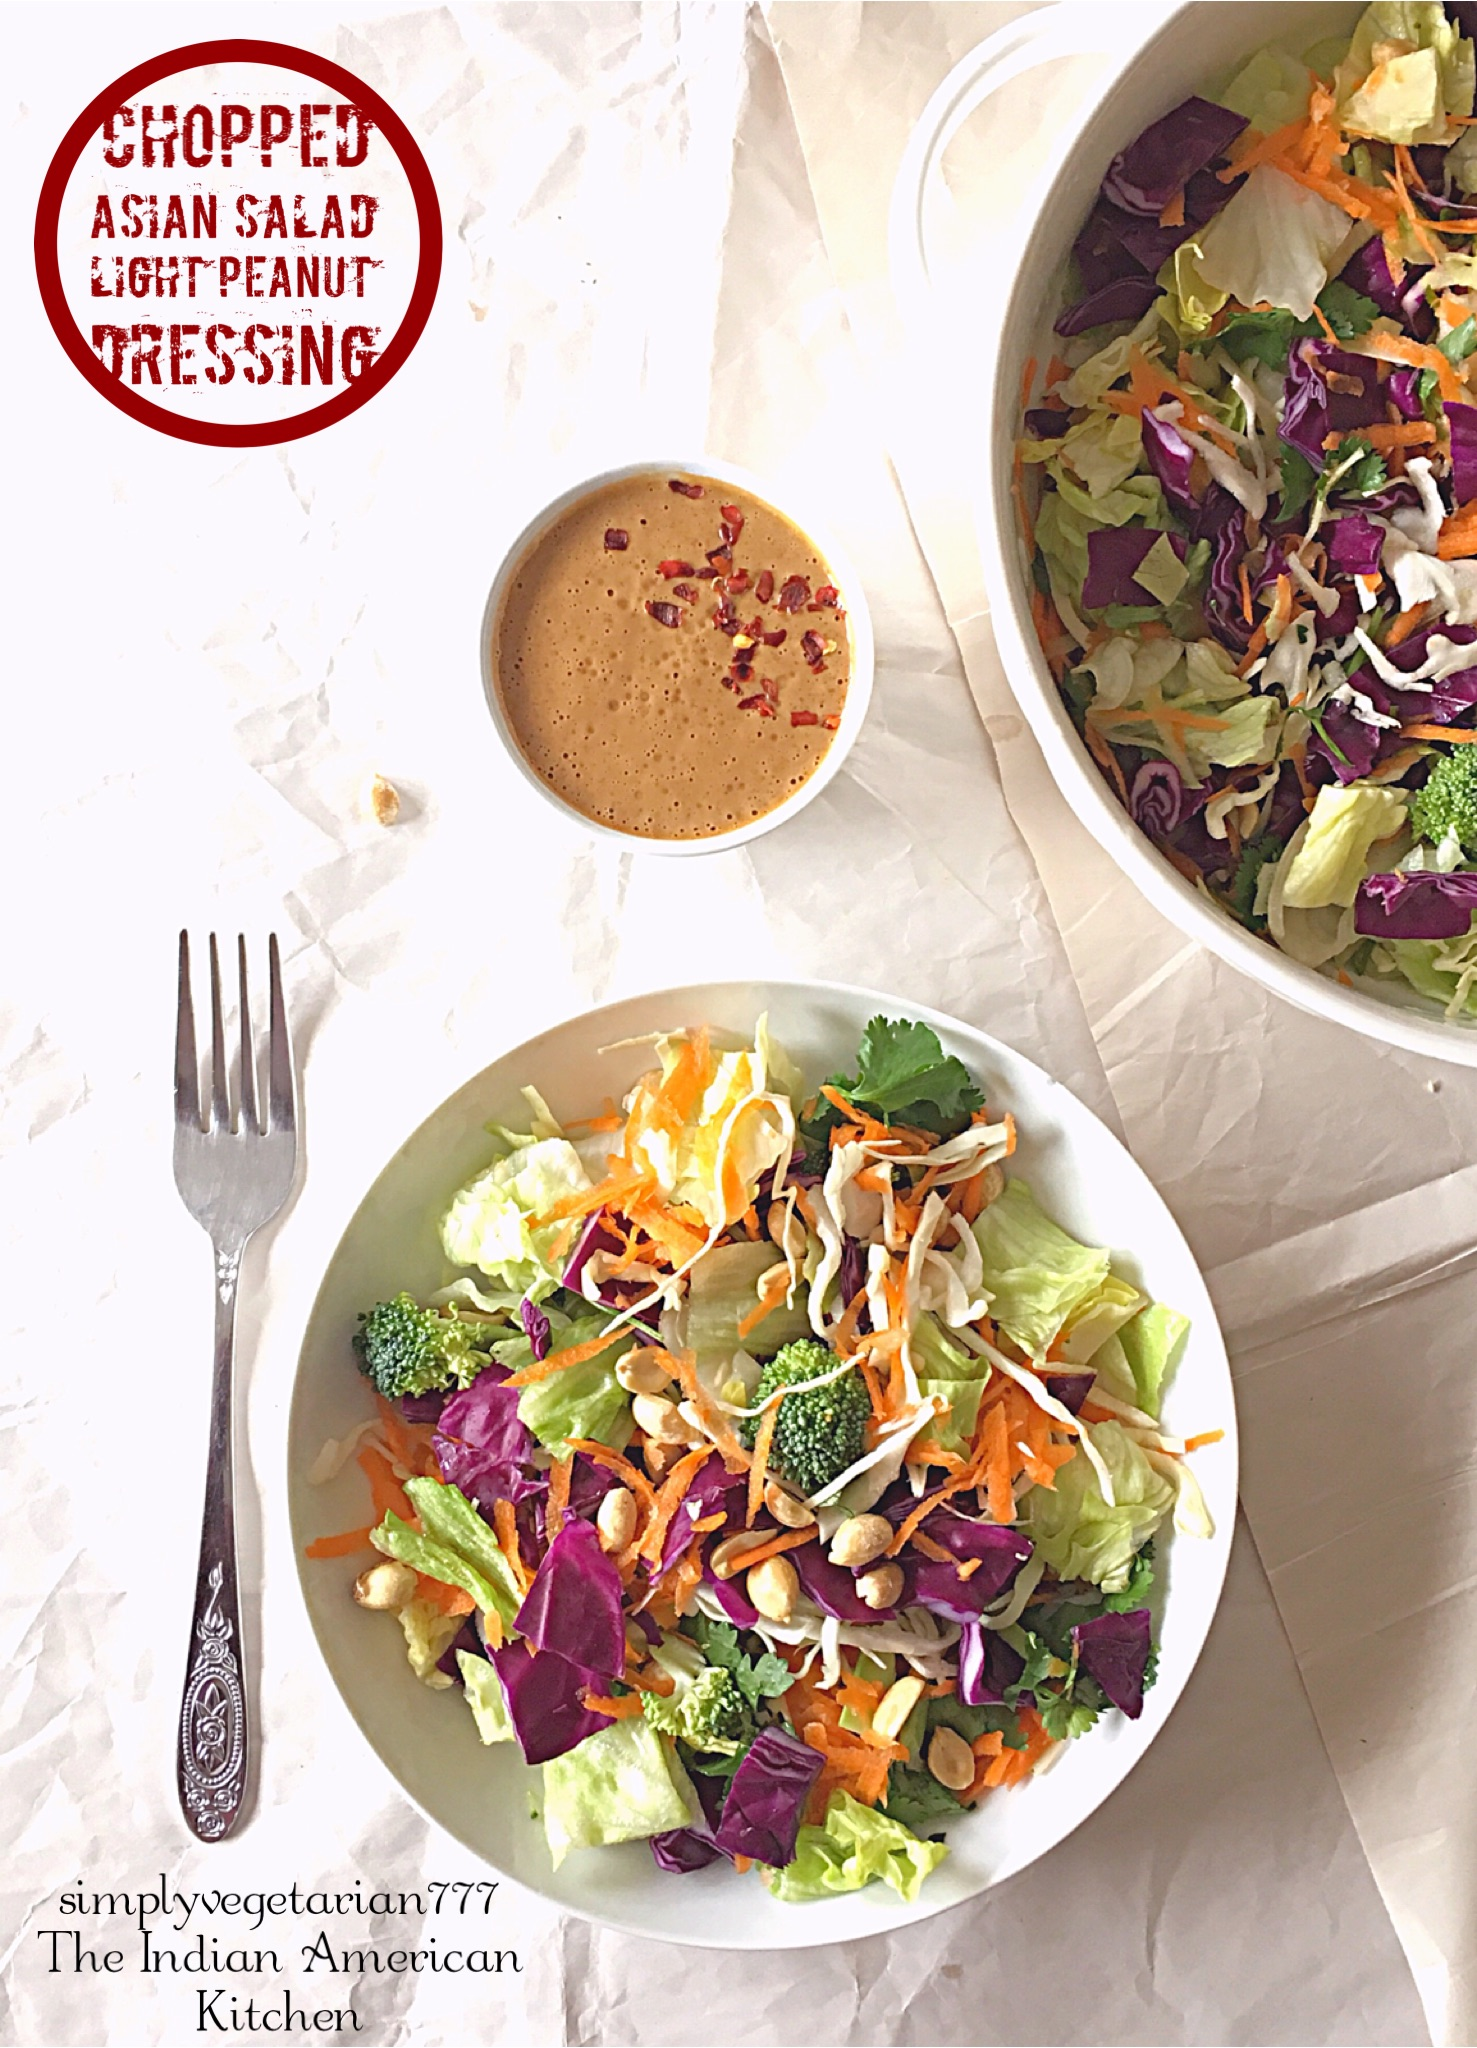 Chopped Asian Salad With Light Peanut Dressing